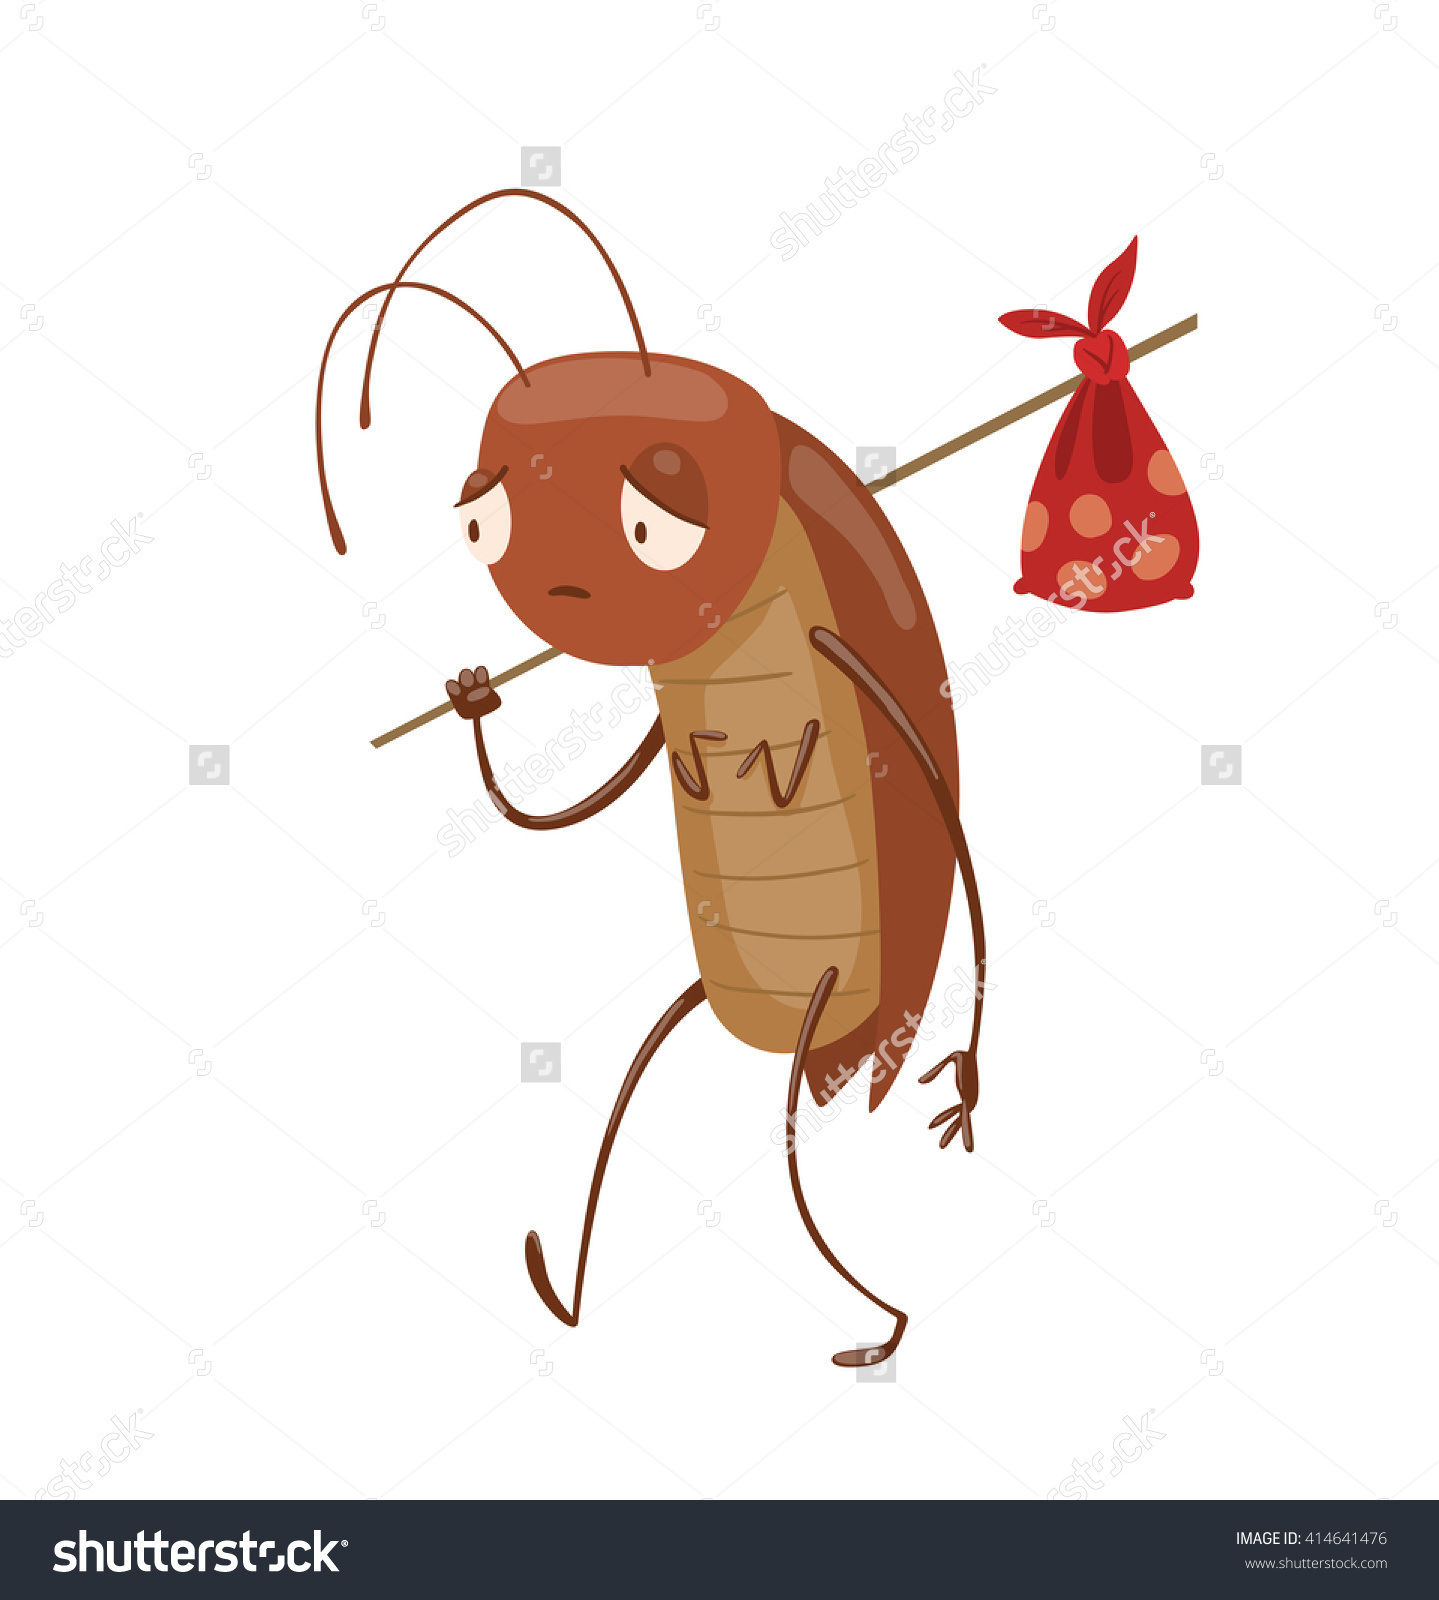 Vector Cartoon Image Funny Brown Cockroach Stock Vector 414641476.